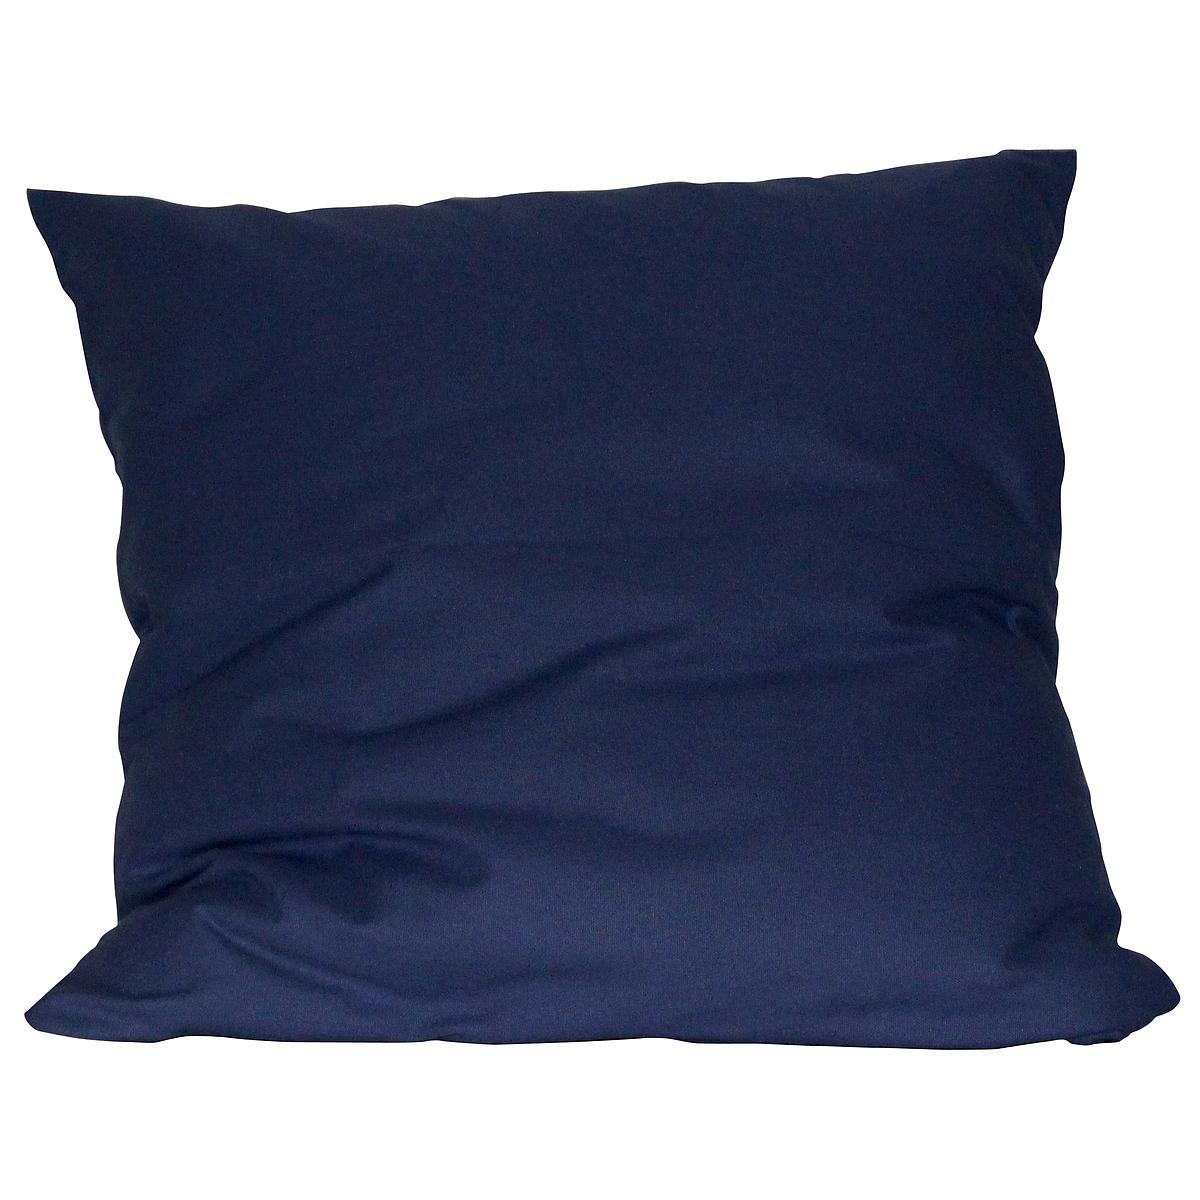 Kissen gross 60x60 DELUXE de Breuyn in dunkelblau